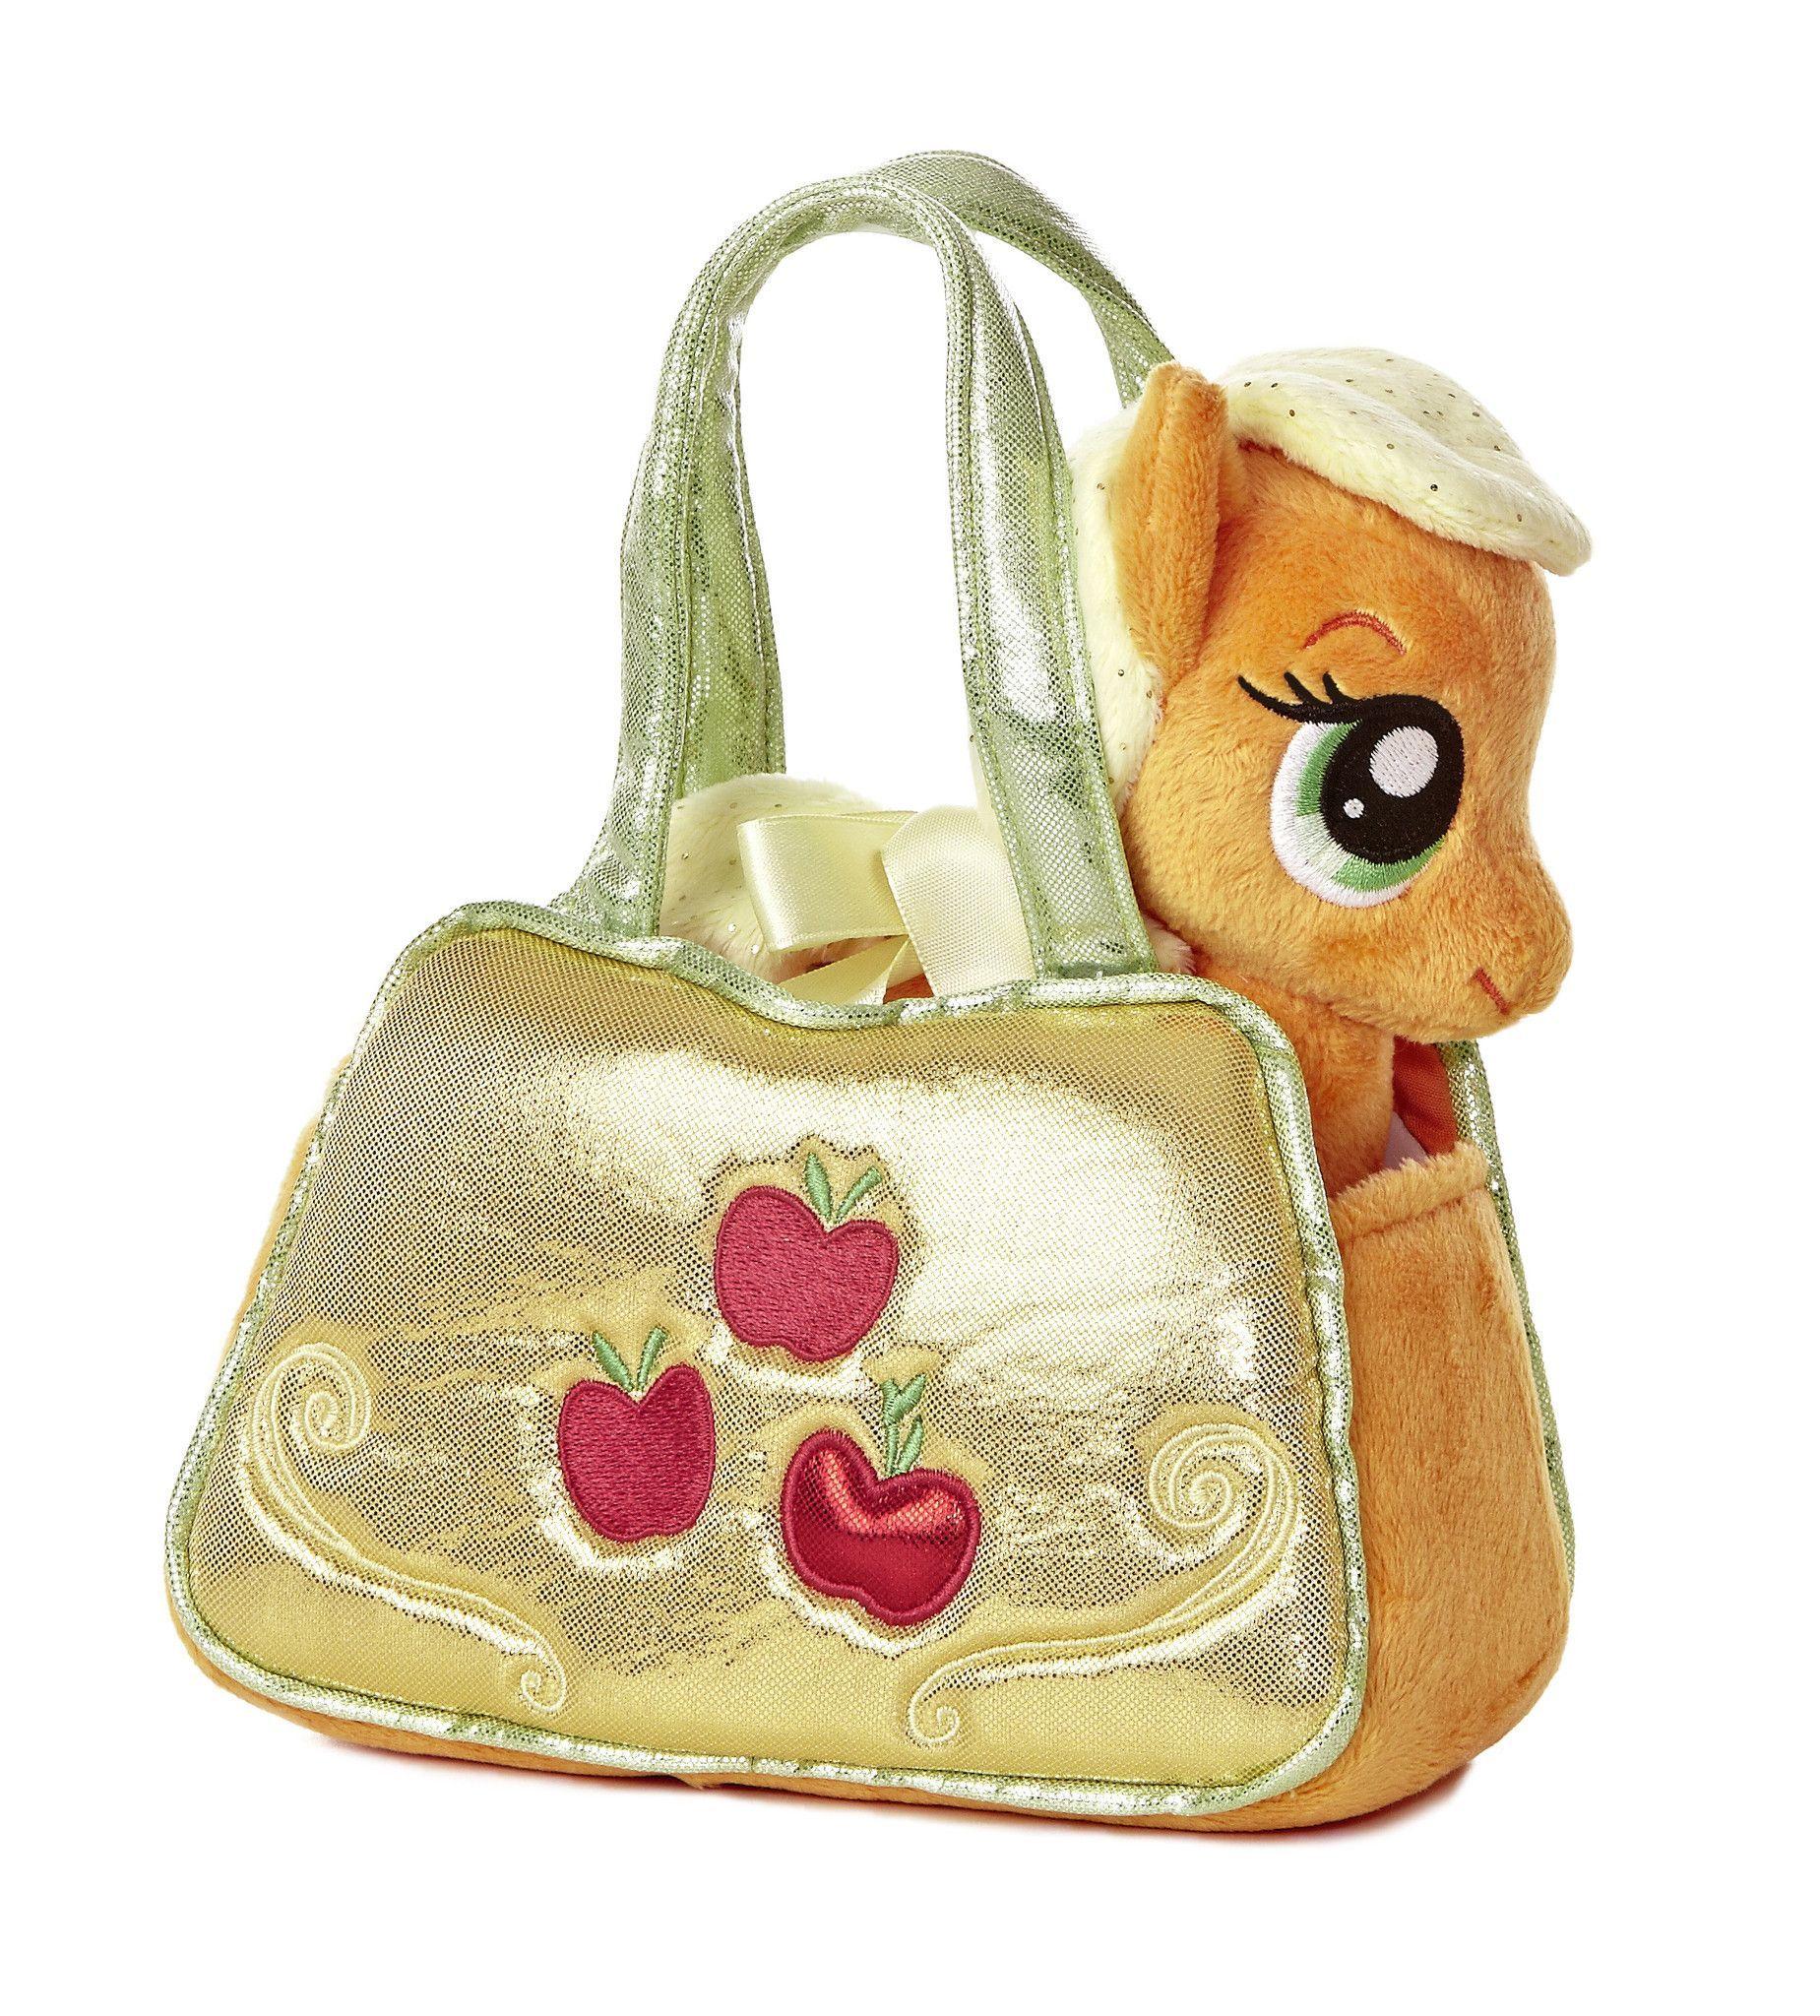 My Little Pony Apple Jack Cutie Mark Purse My Little Pony Applejack My Little Pony Pictures My Little Pony